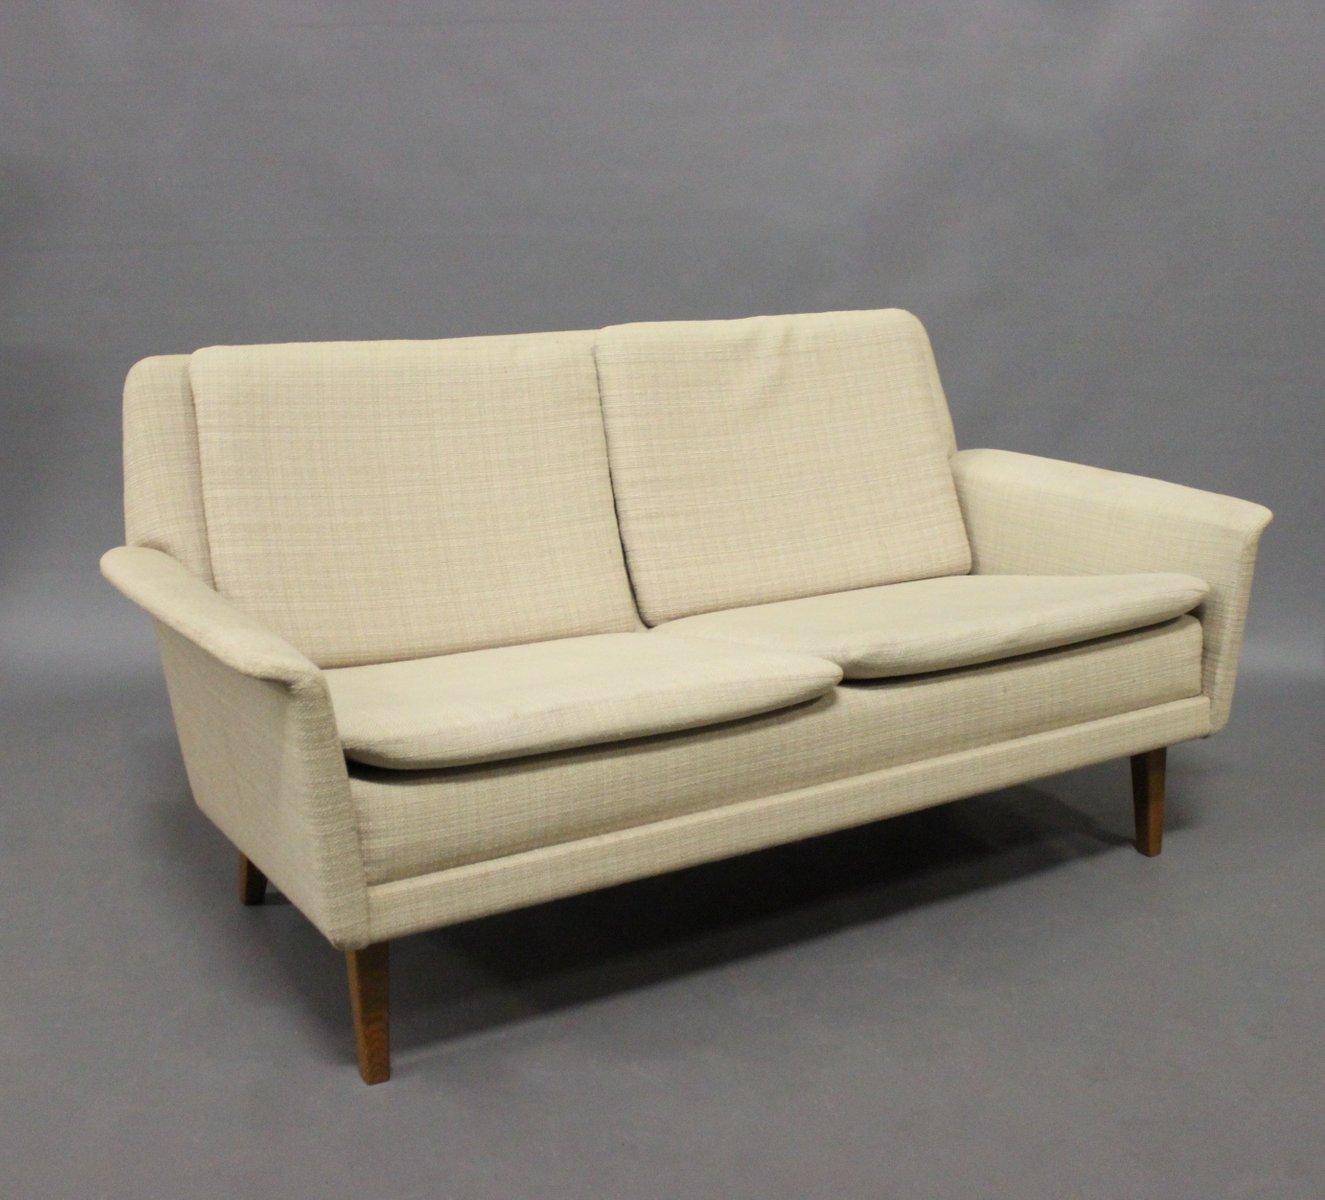 dux sofa by folke ohlsson leather atlanta georgia 2 seater for fritz hansen 1960s